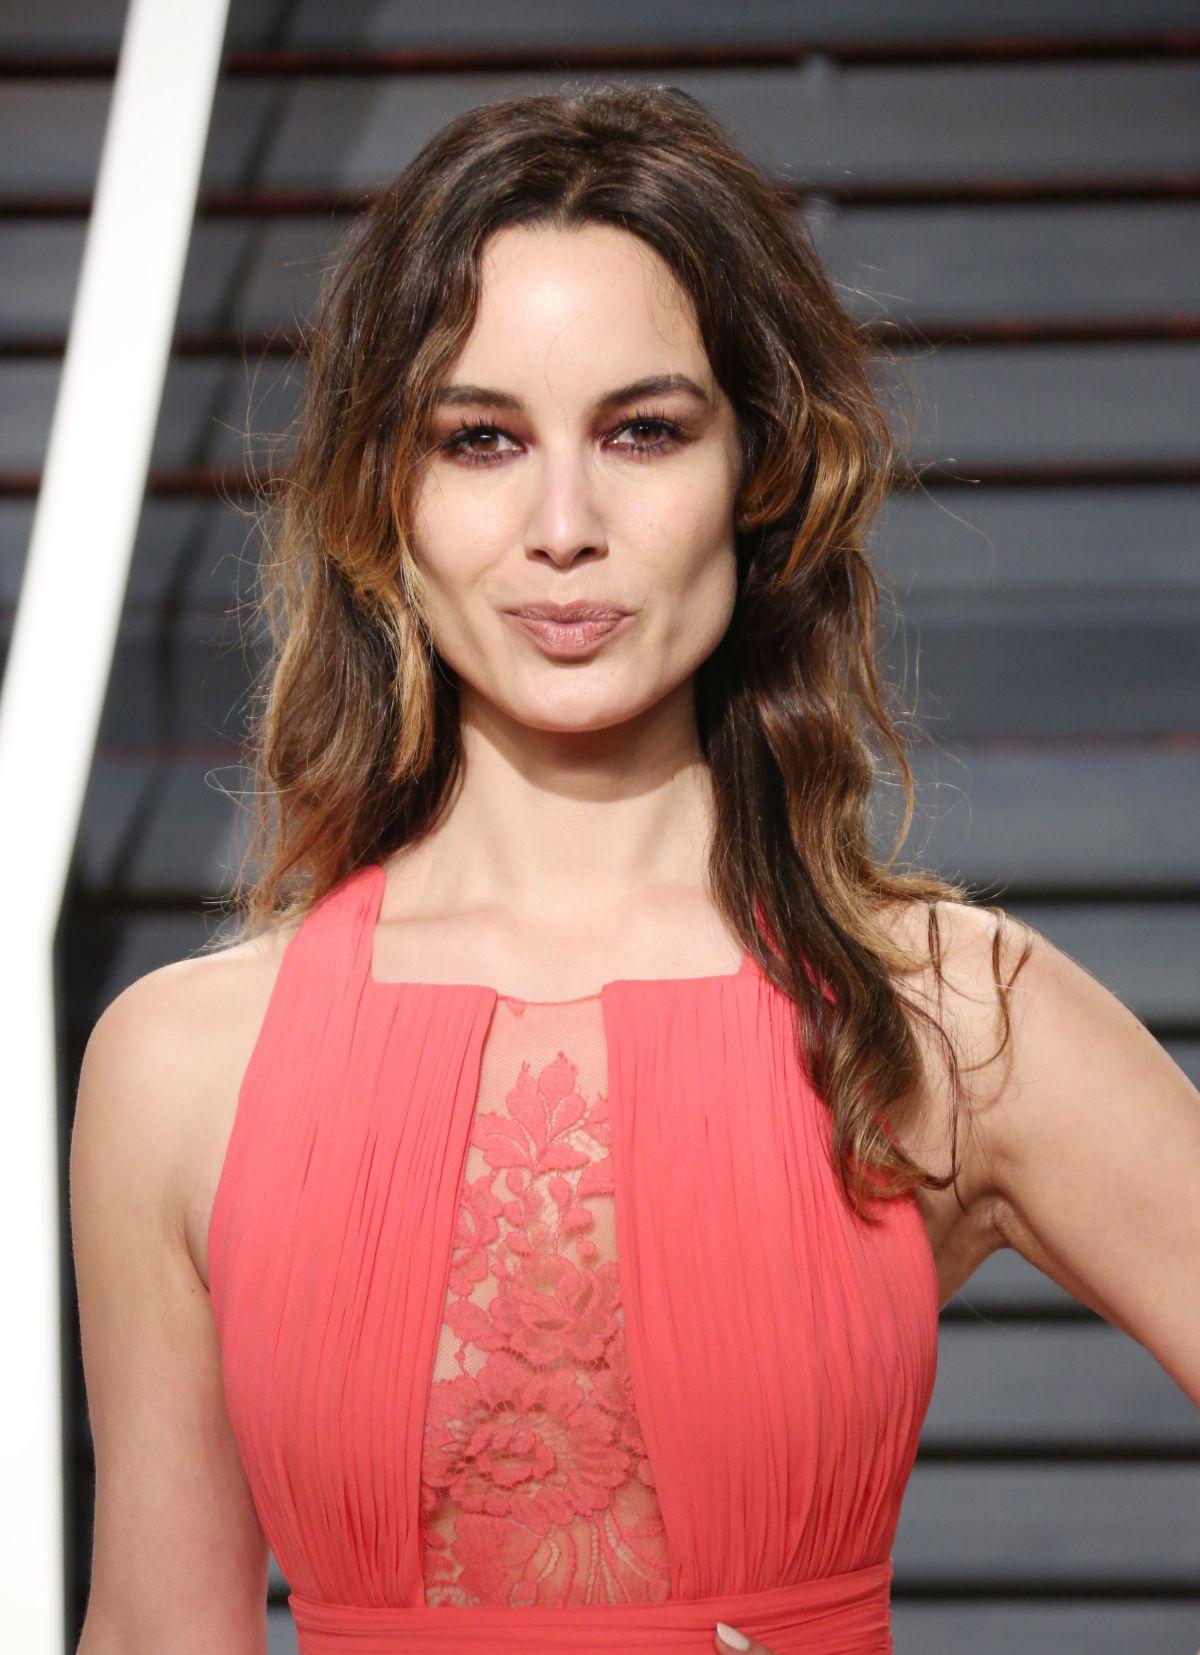 BERENICE MARLOHE at 2017 Vanity Fair Oscar Party in